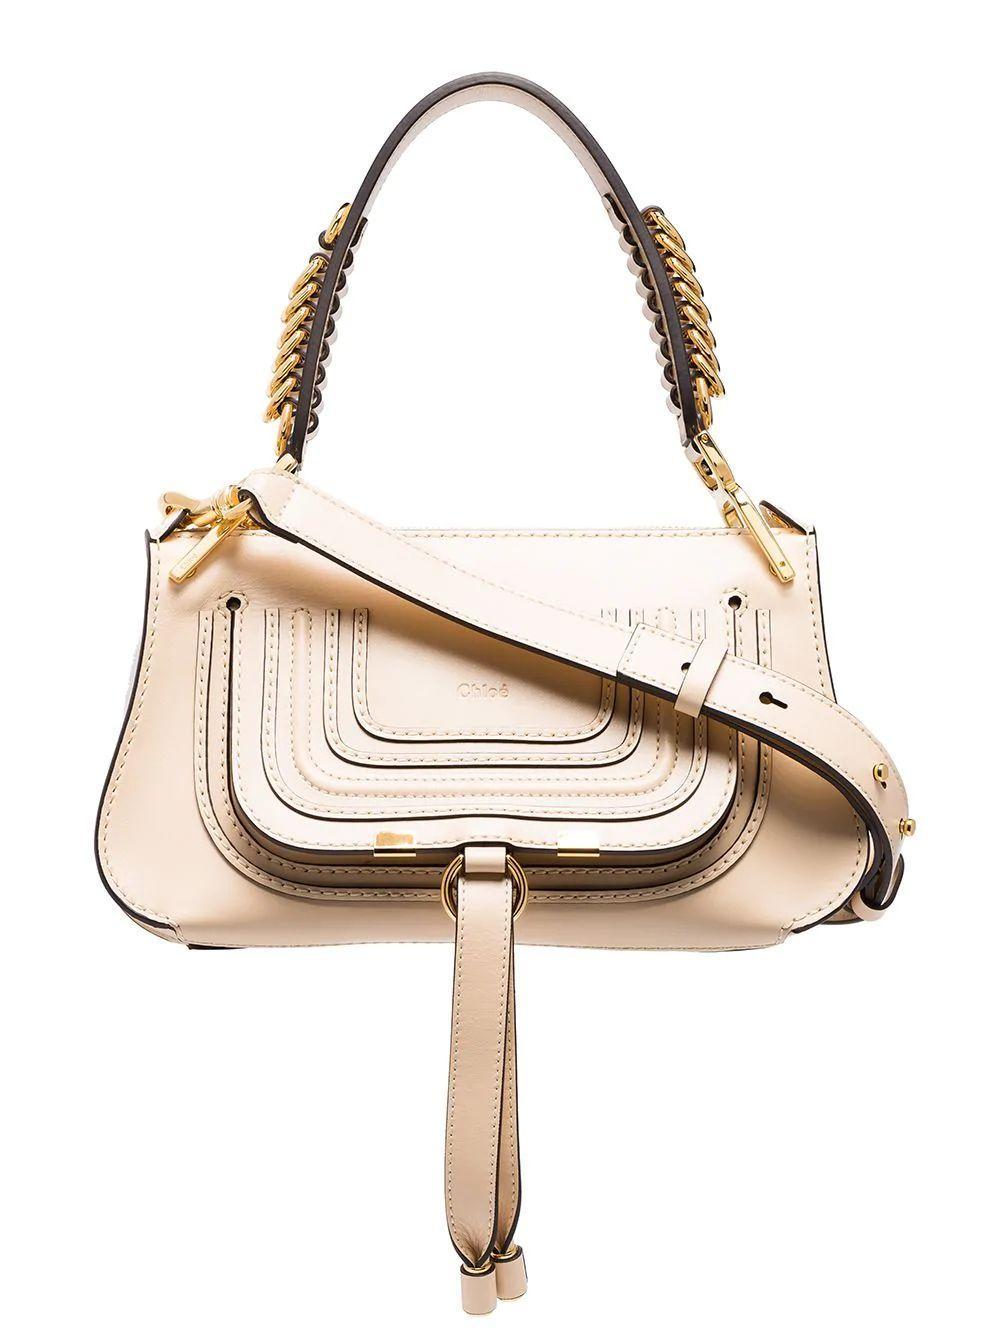 Marcie Small Leather Saddle Bag